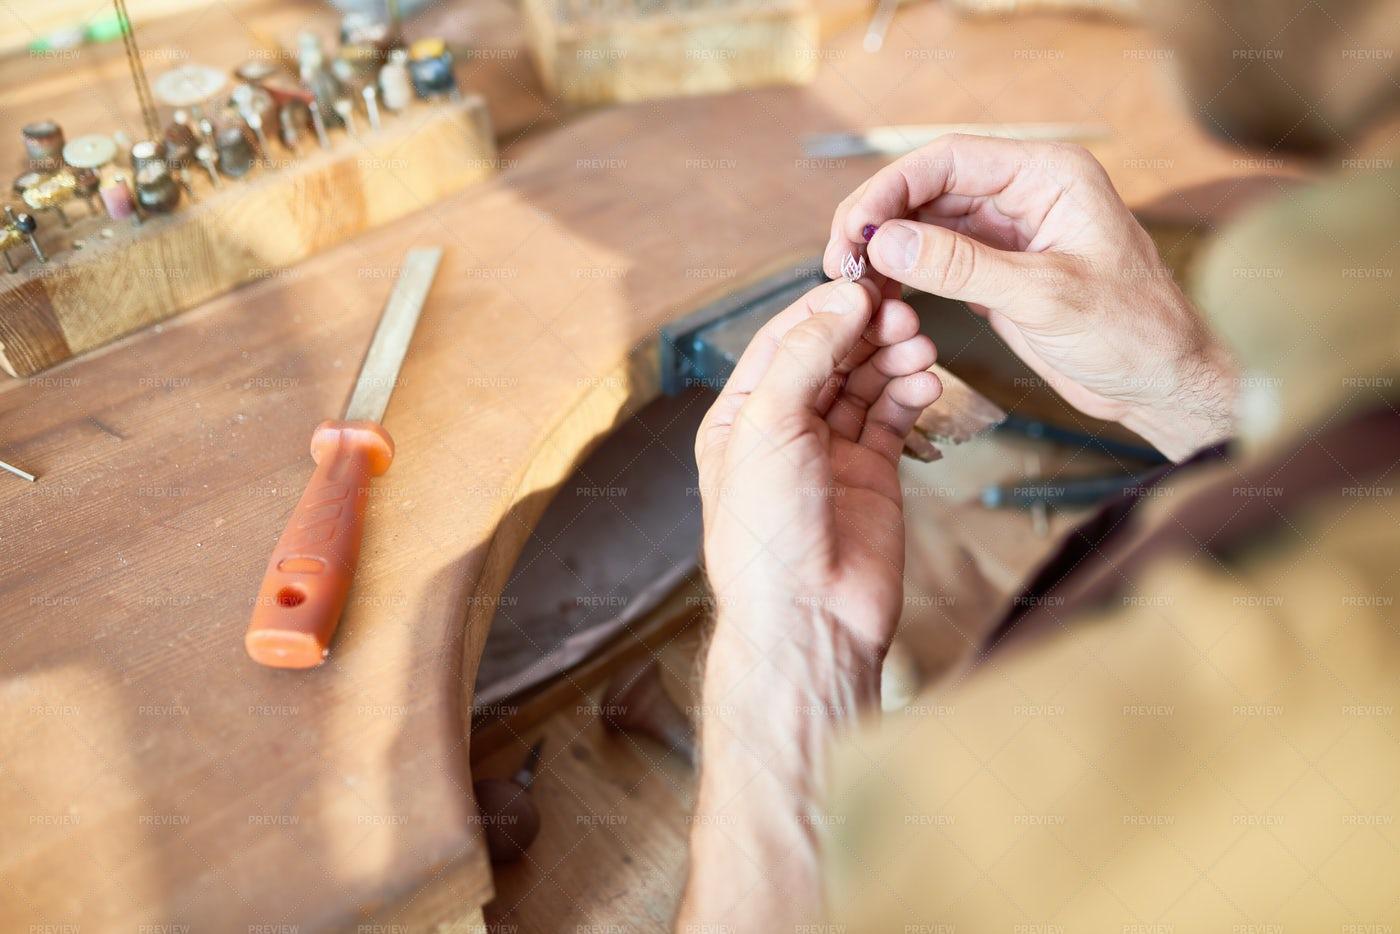 Jeweler Making Silver Decoration: Stock Photos